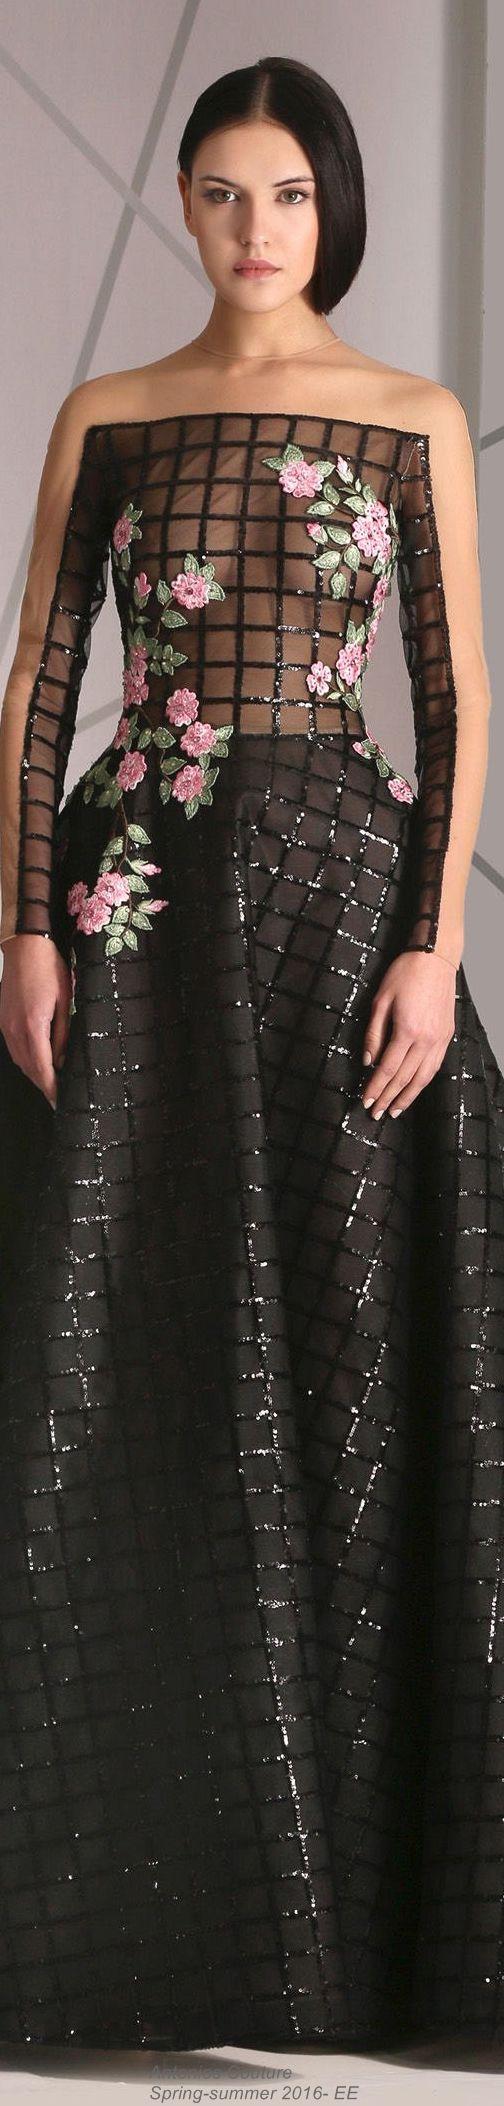 Antonios Couture Spring-summer 2016- EE jαɢlαdy